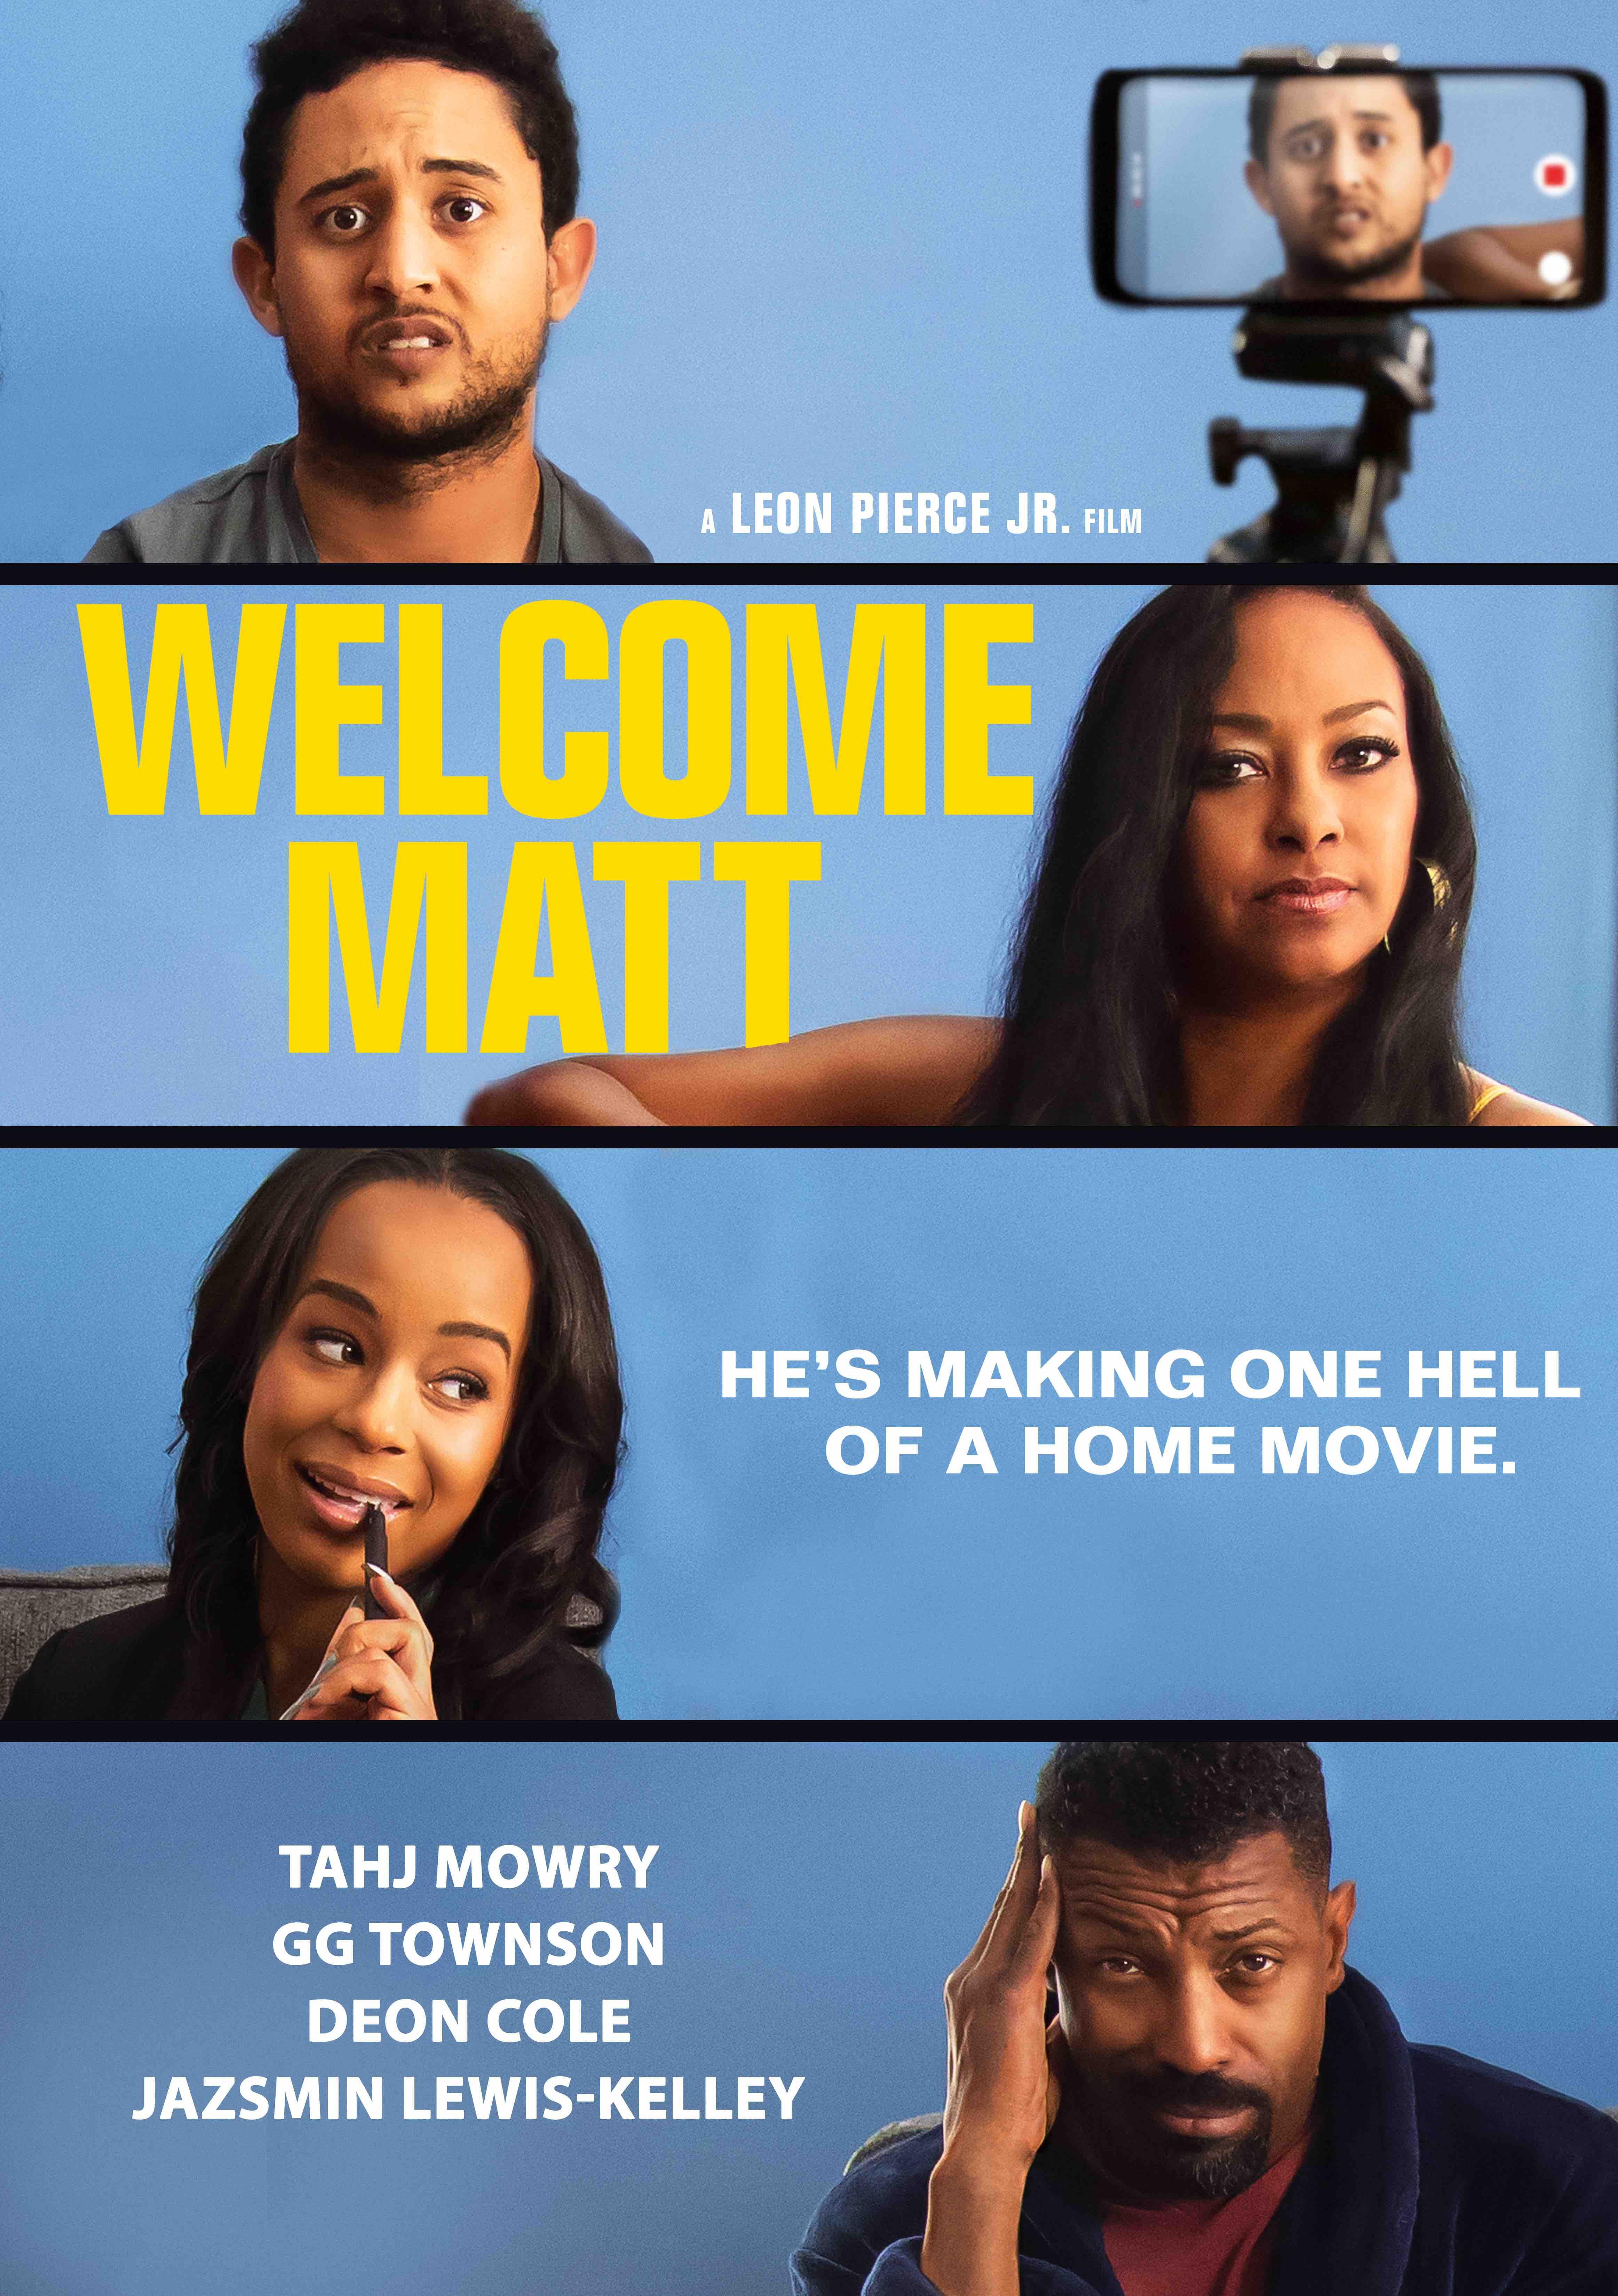 watch Welcome Matt on soap2day